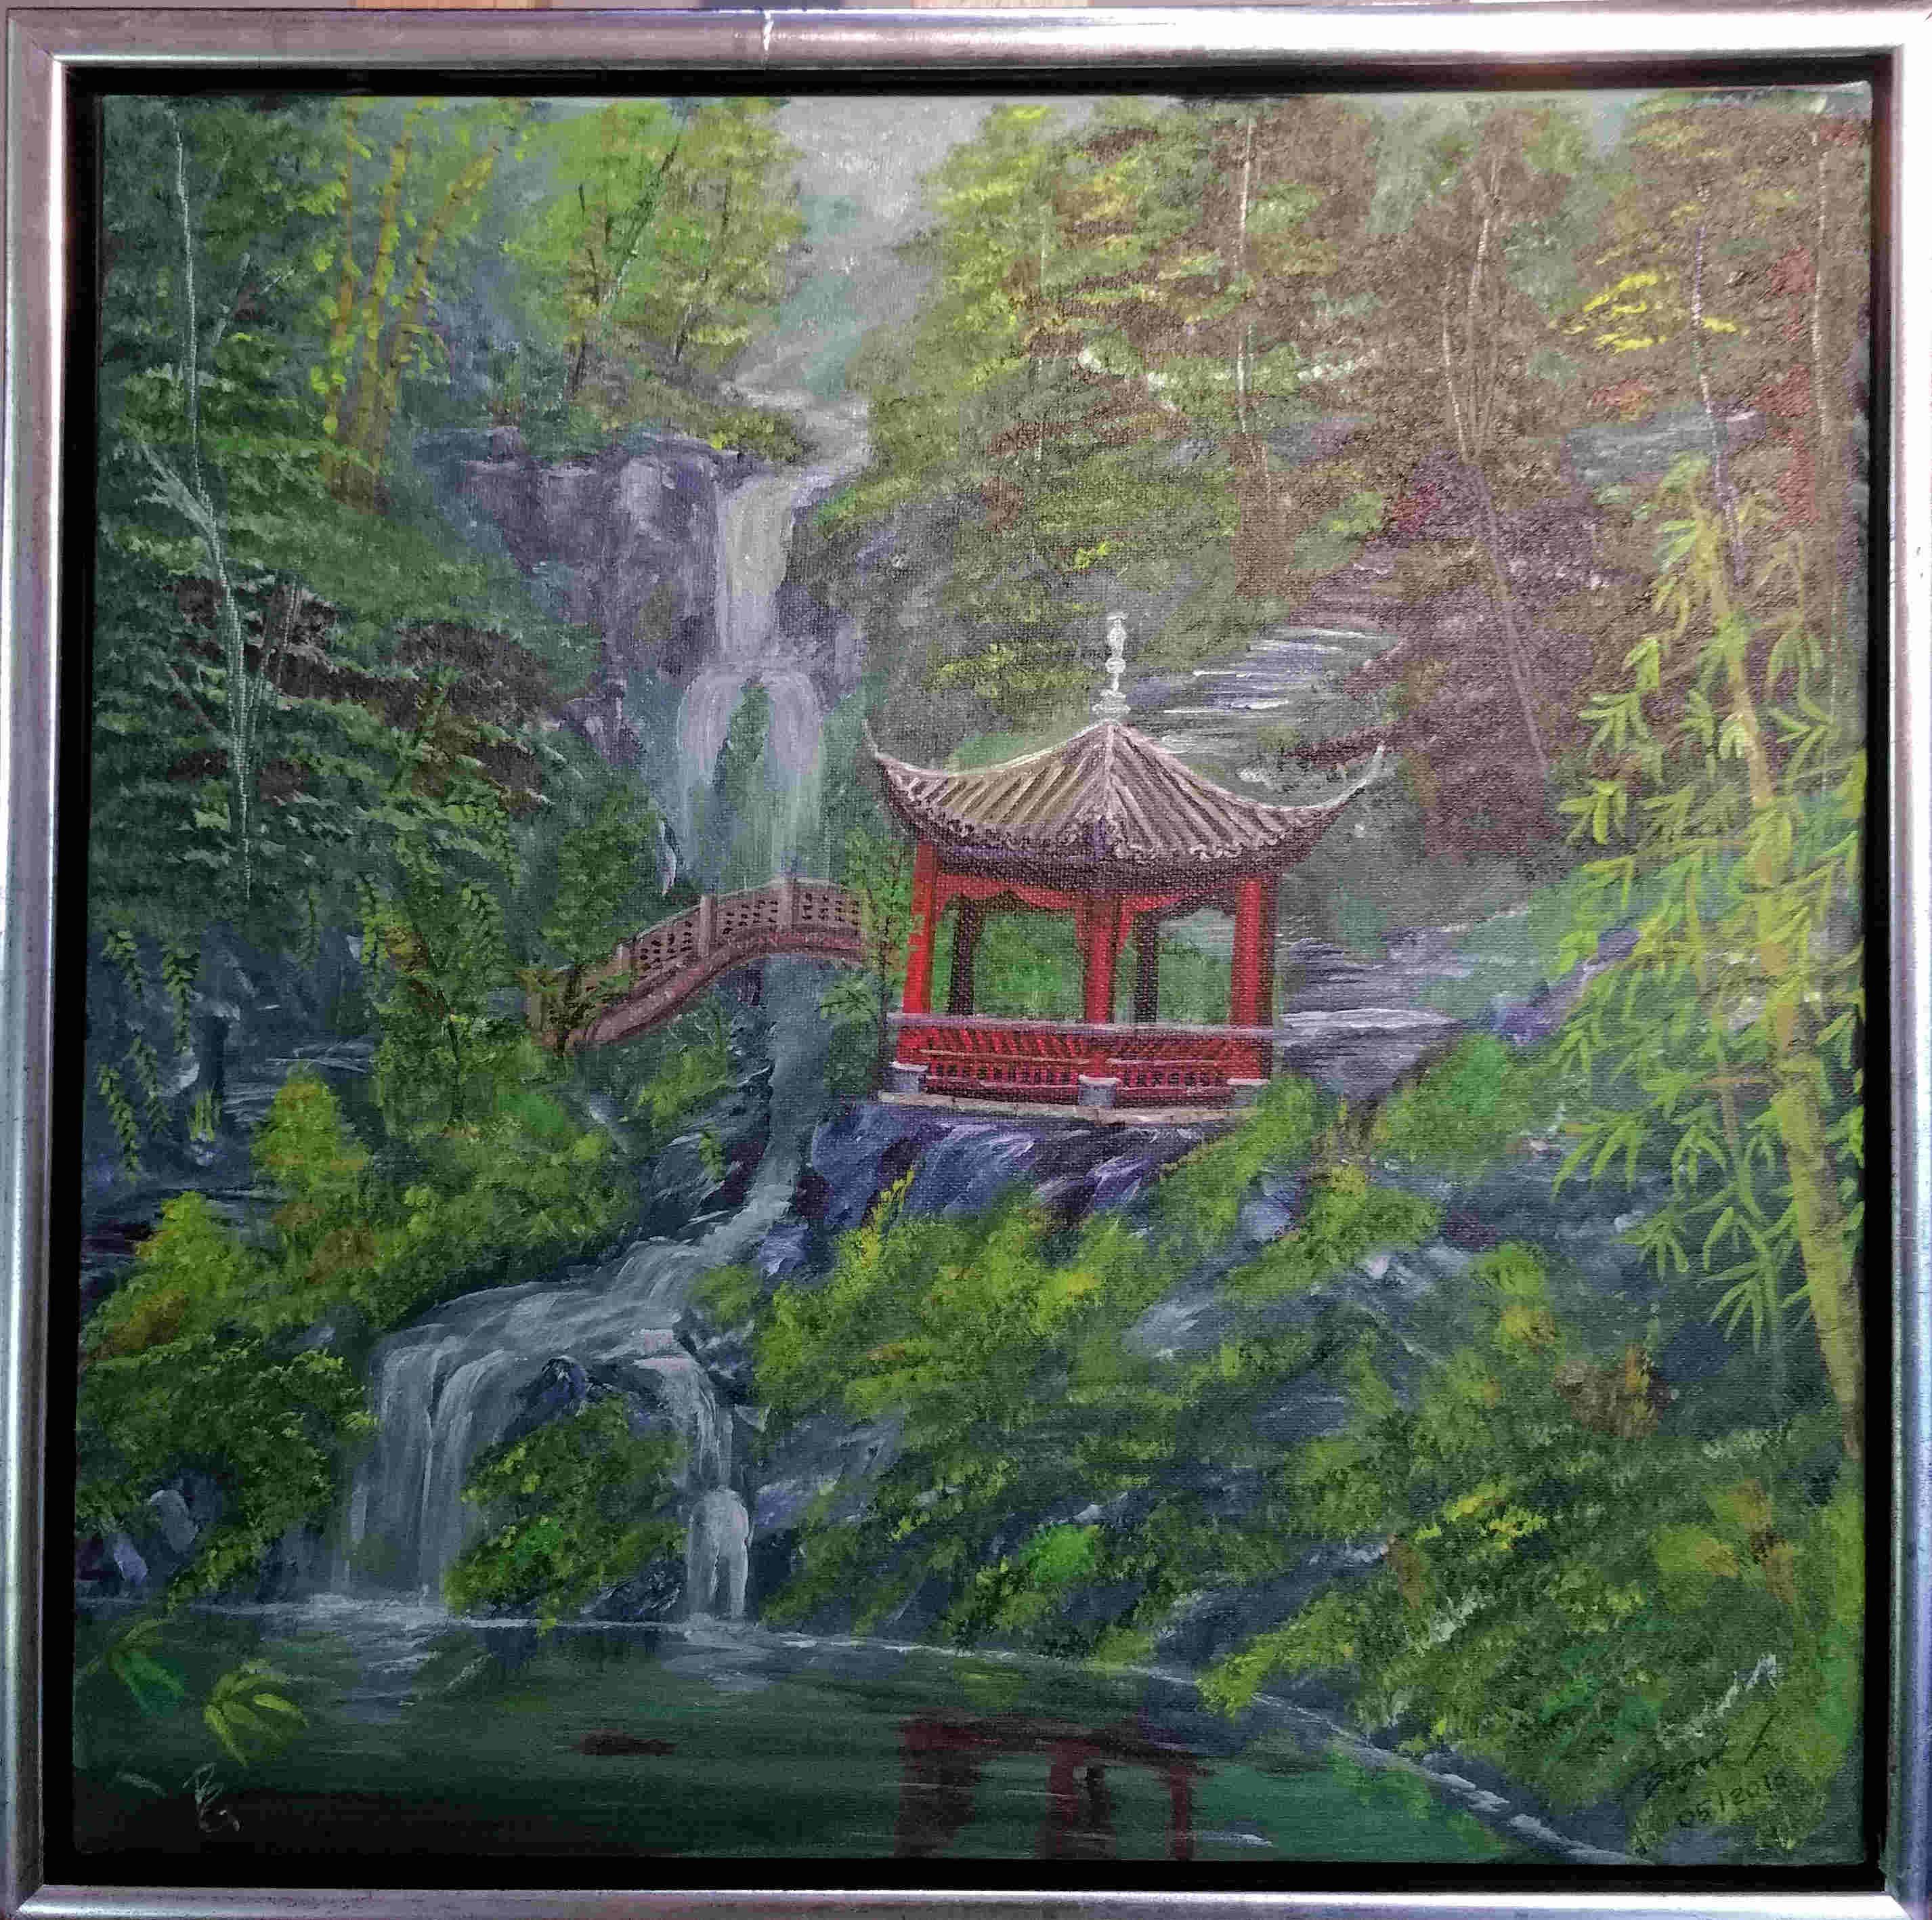 201605 Pavillon Landschaft China 001